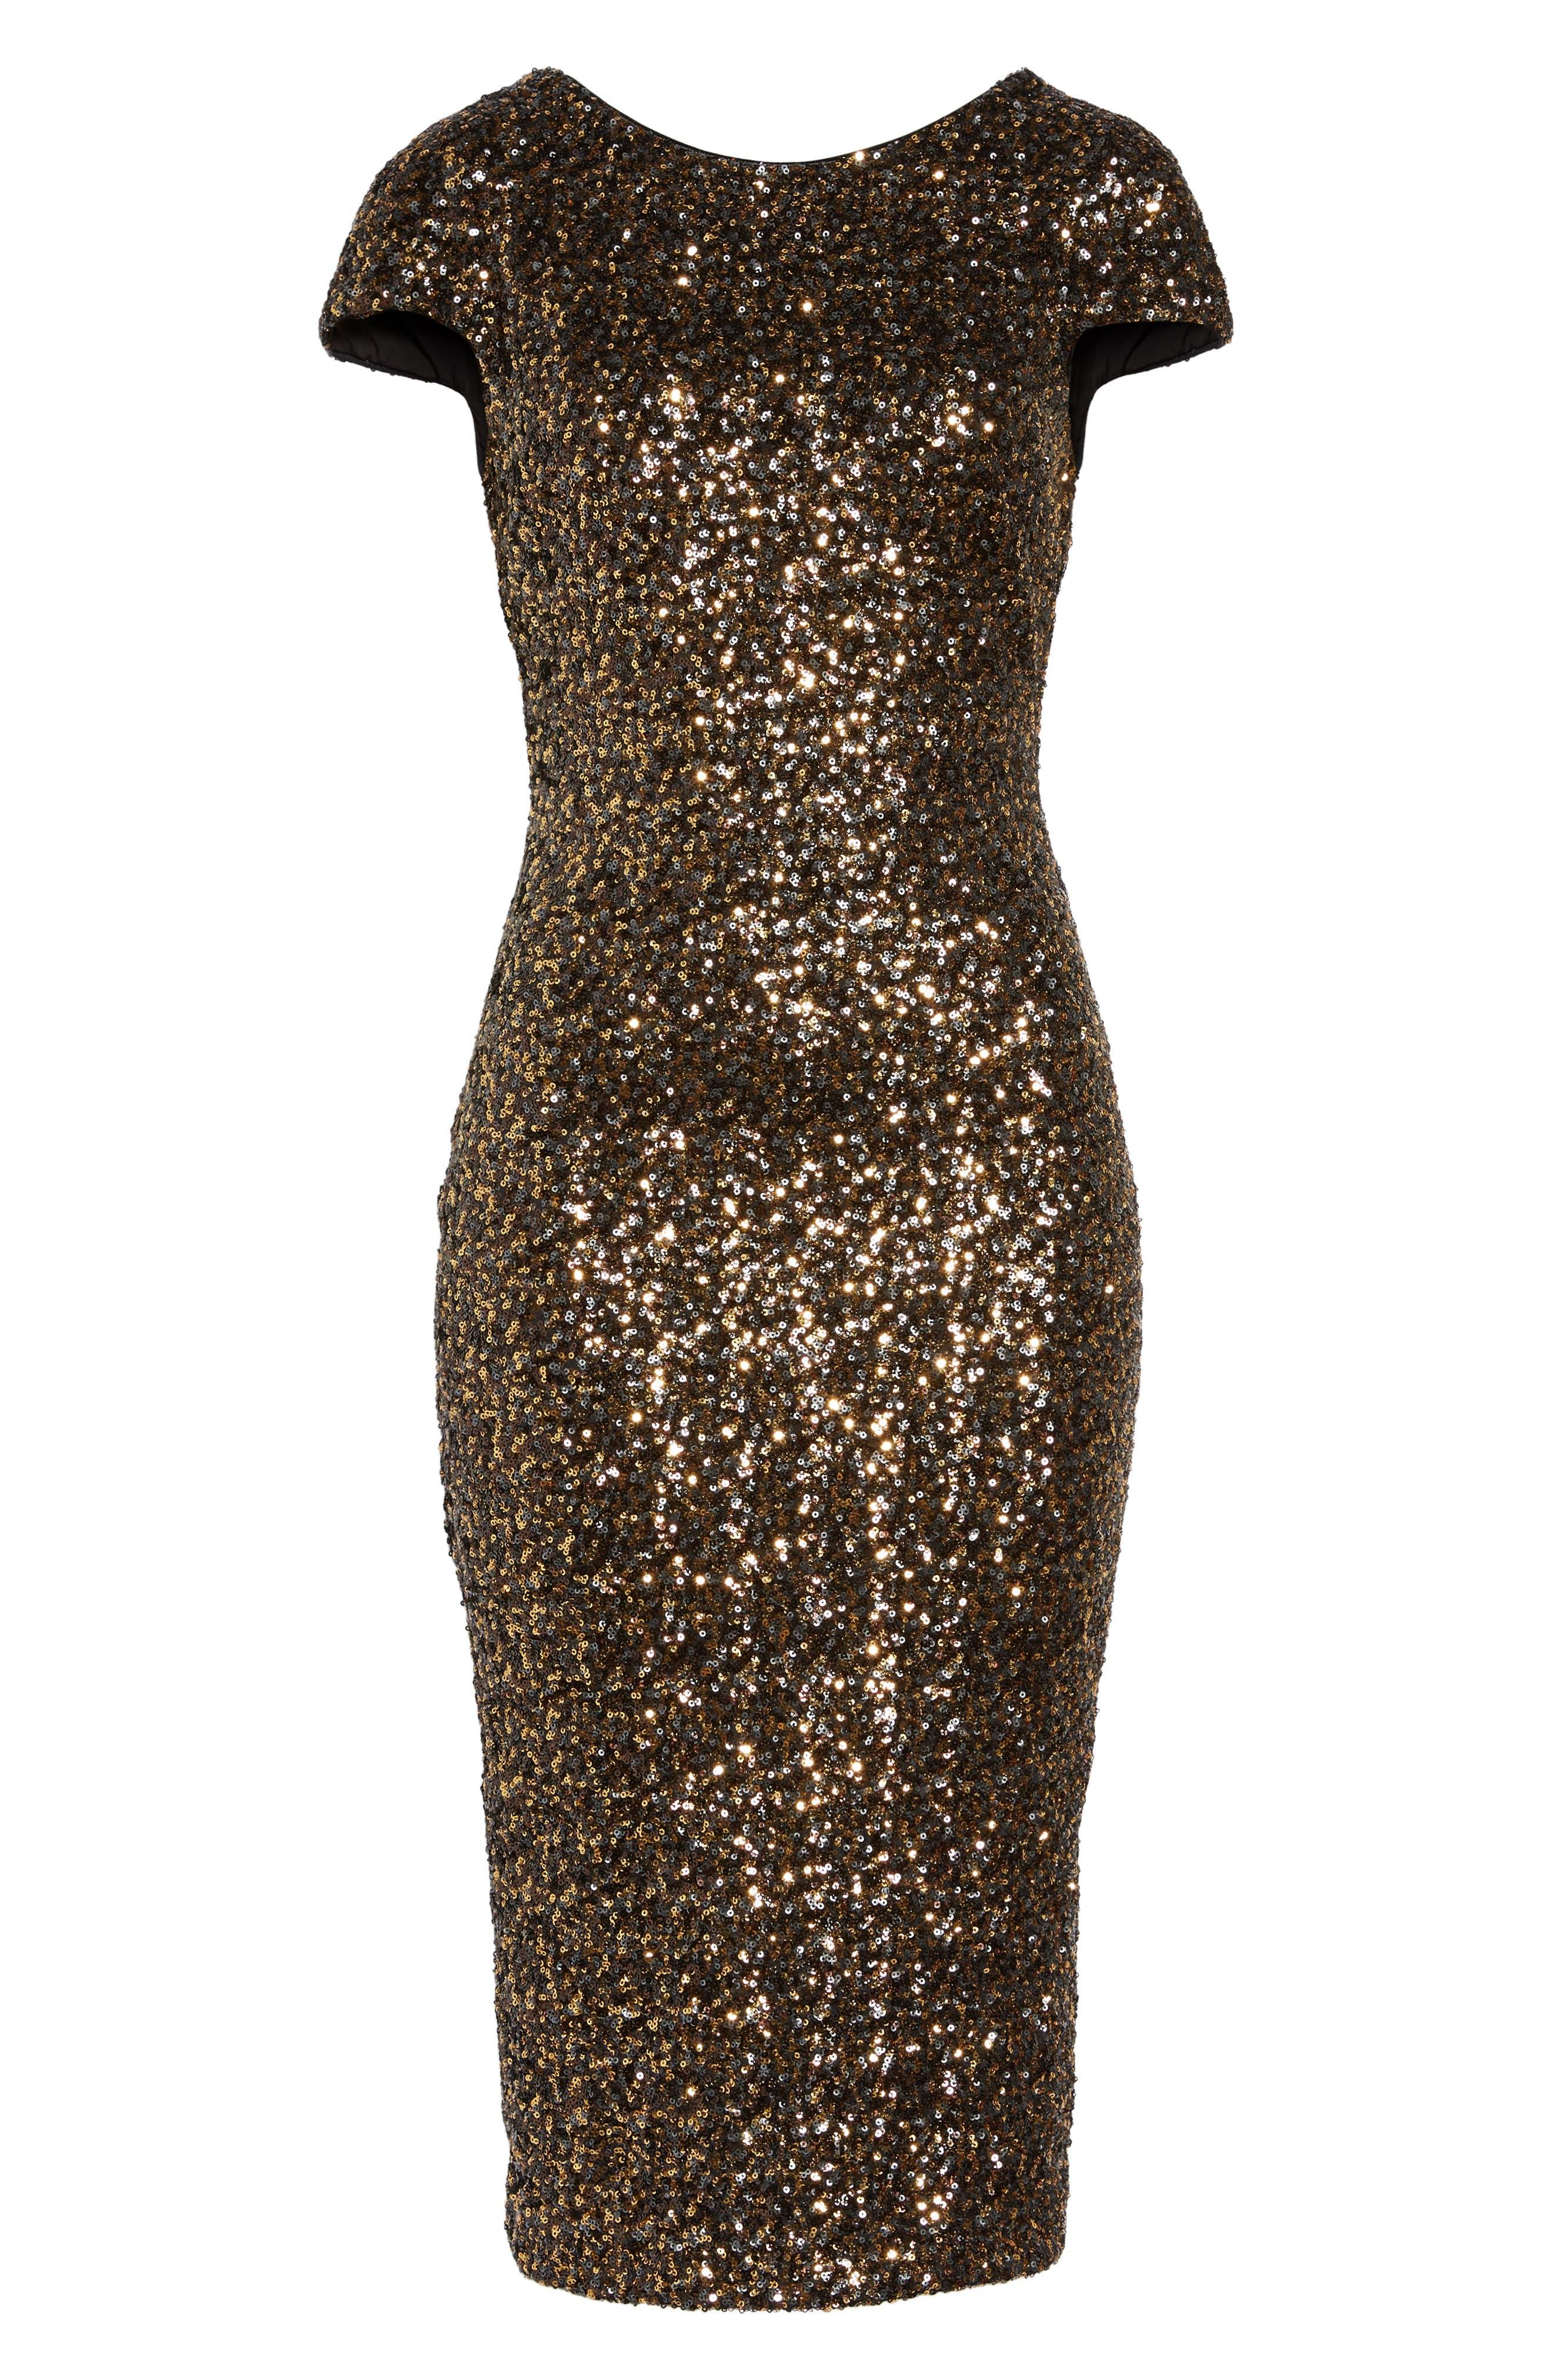 'Marcella' Open Back Sequin Body-Con Dress,                             Main thumbnail 1, color,                             716